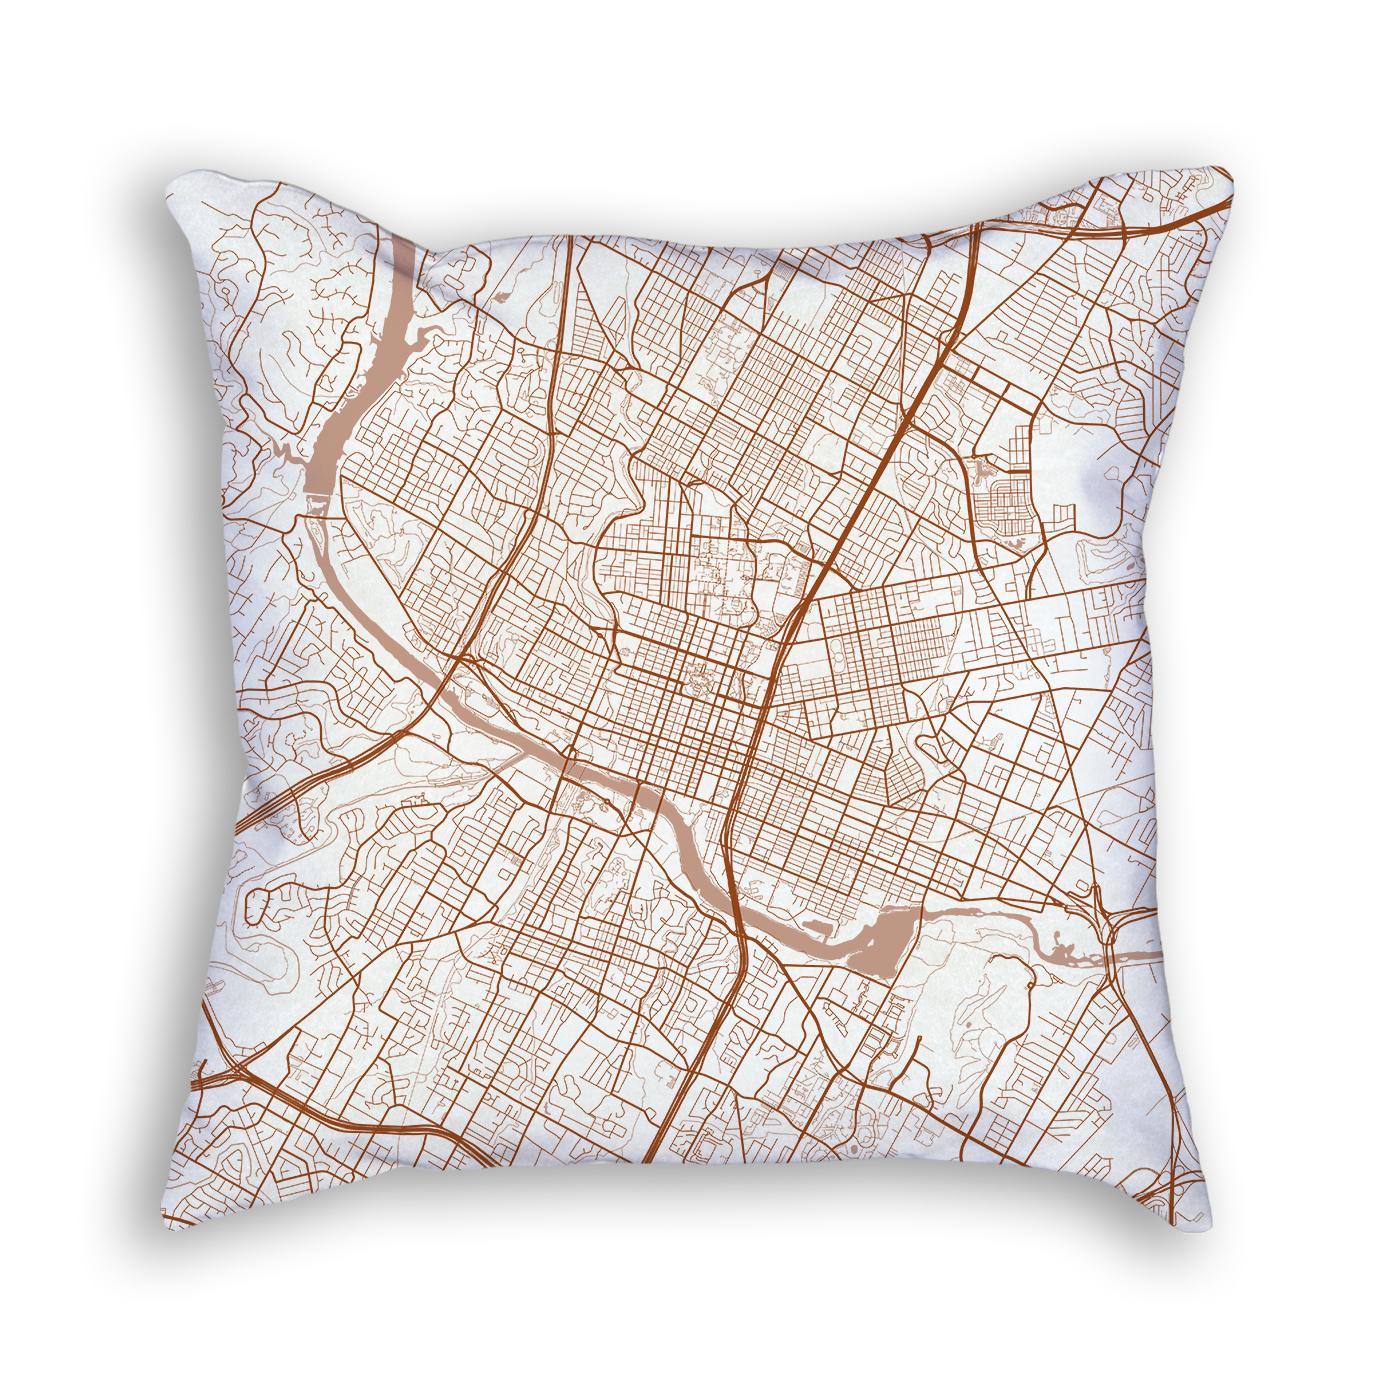 Austin Texas Throw Pillow – City Map Decor - Texas Map Pillow